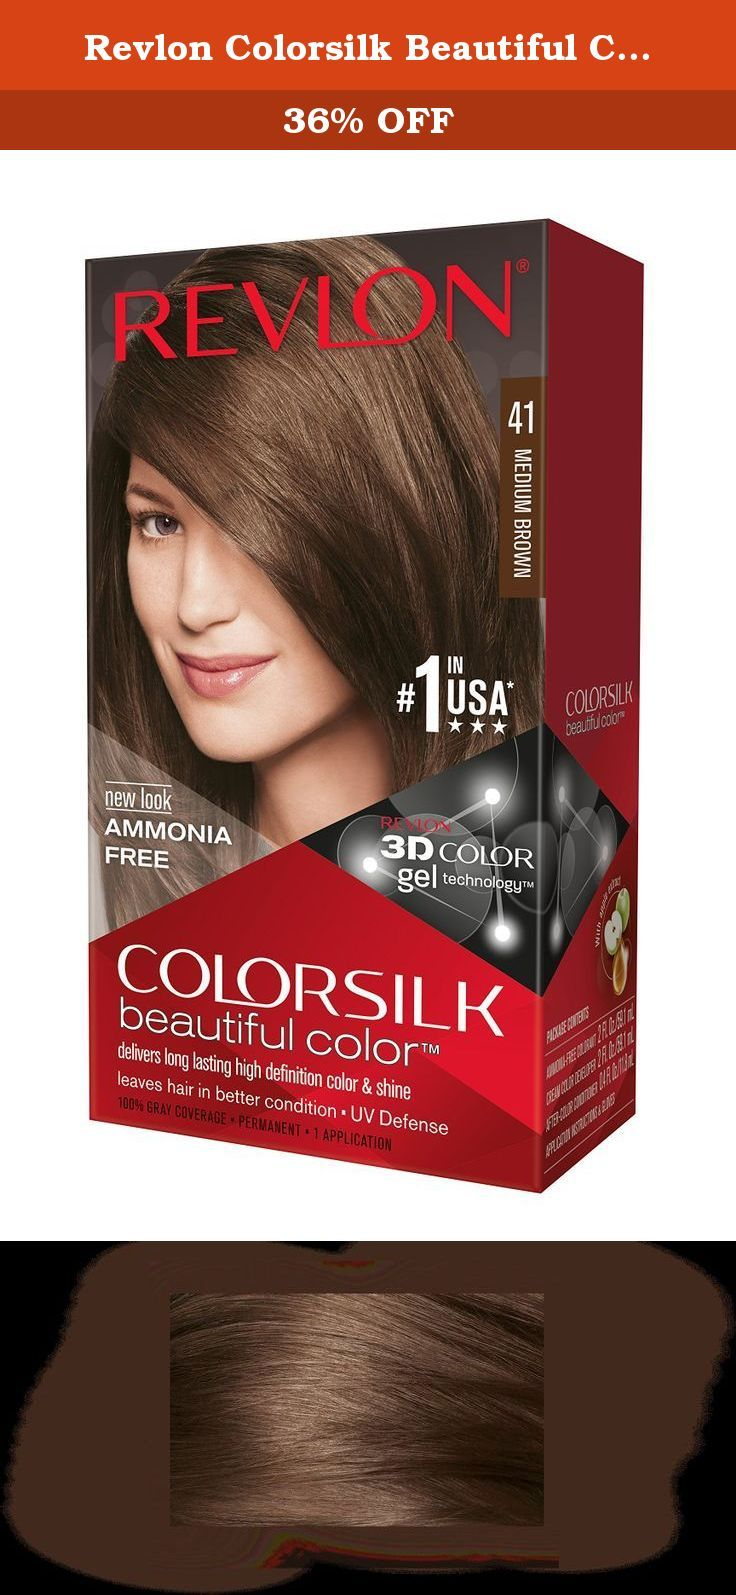 Colorsilk beautiful color 55 light reddish brown by revlon hair color - Revlon Colorsilk Beautiful Color Medium Brown Our Revlon 3d Color Technology Delivers Natural Looking